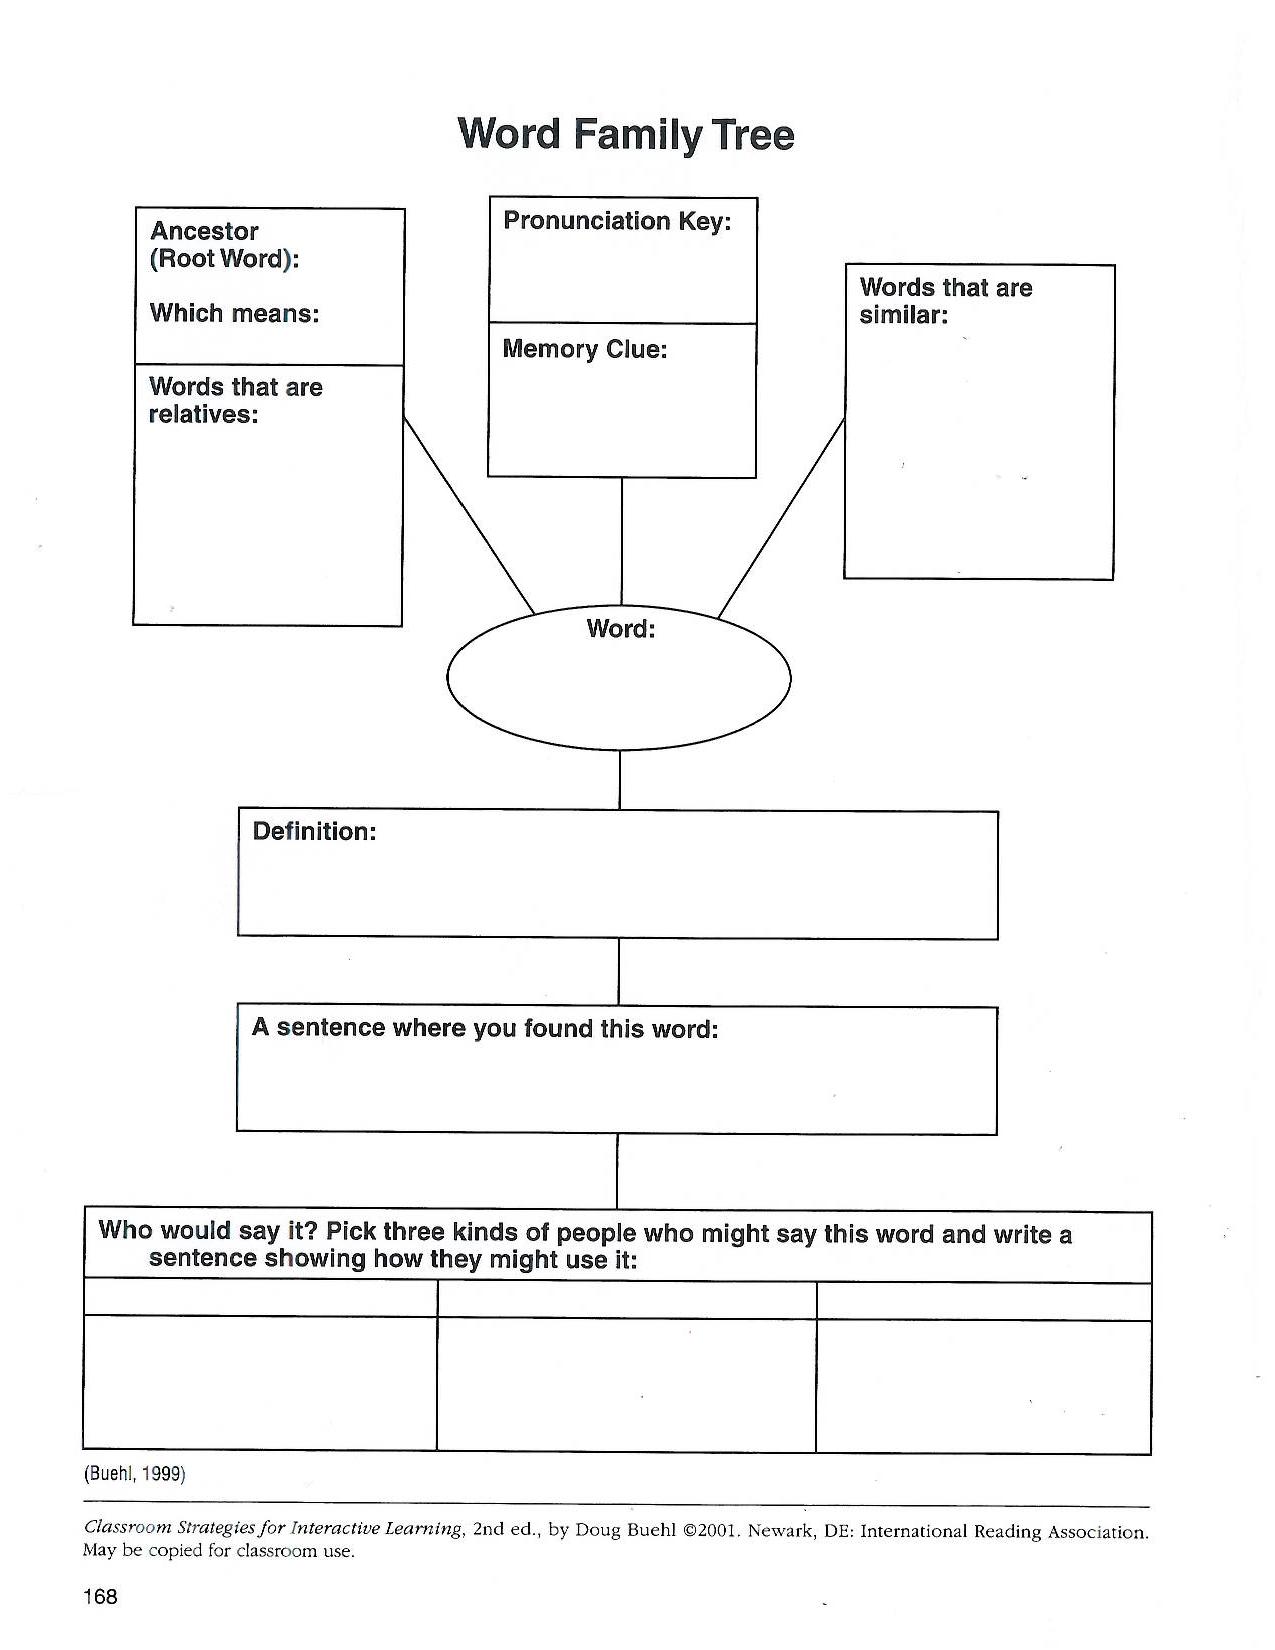 tree graphic organizer template images idea tree graphic organizer